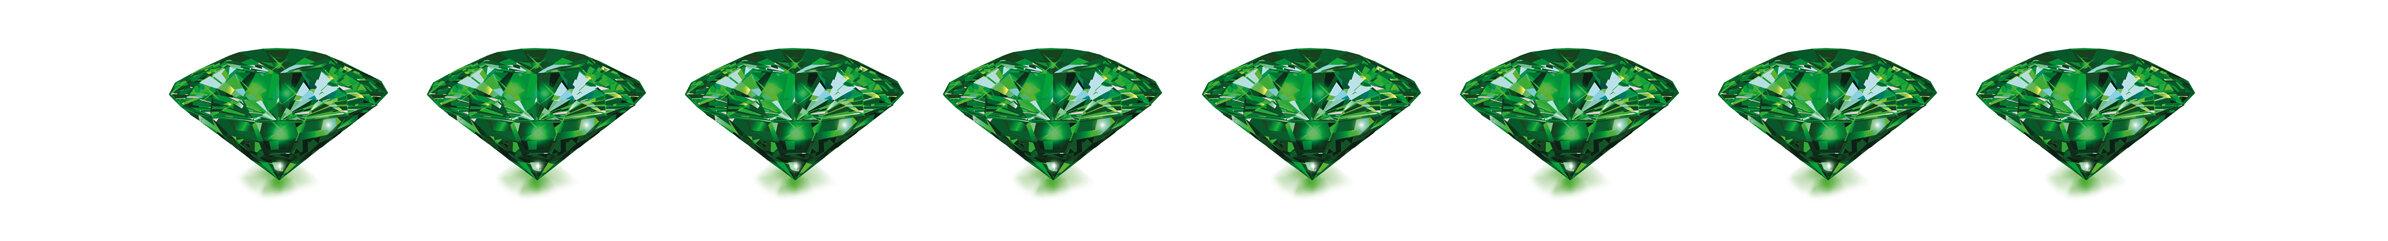 Emerald03.jpg